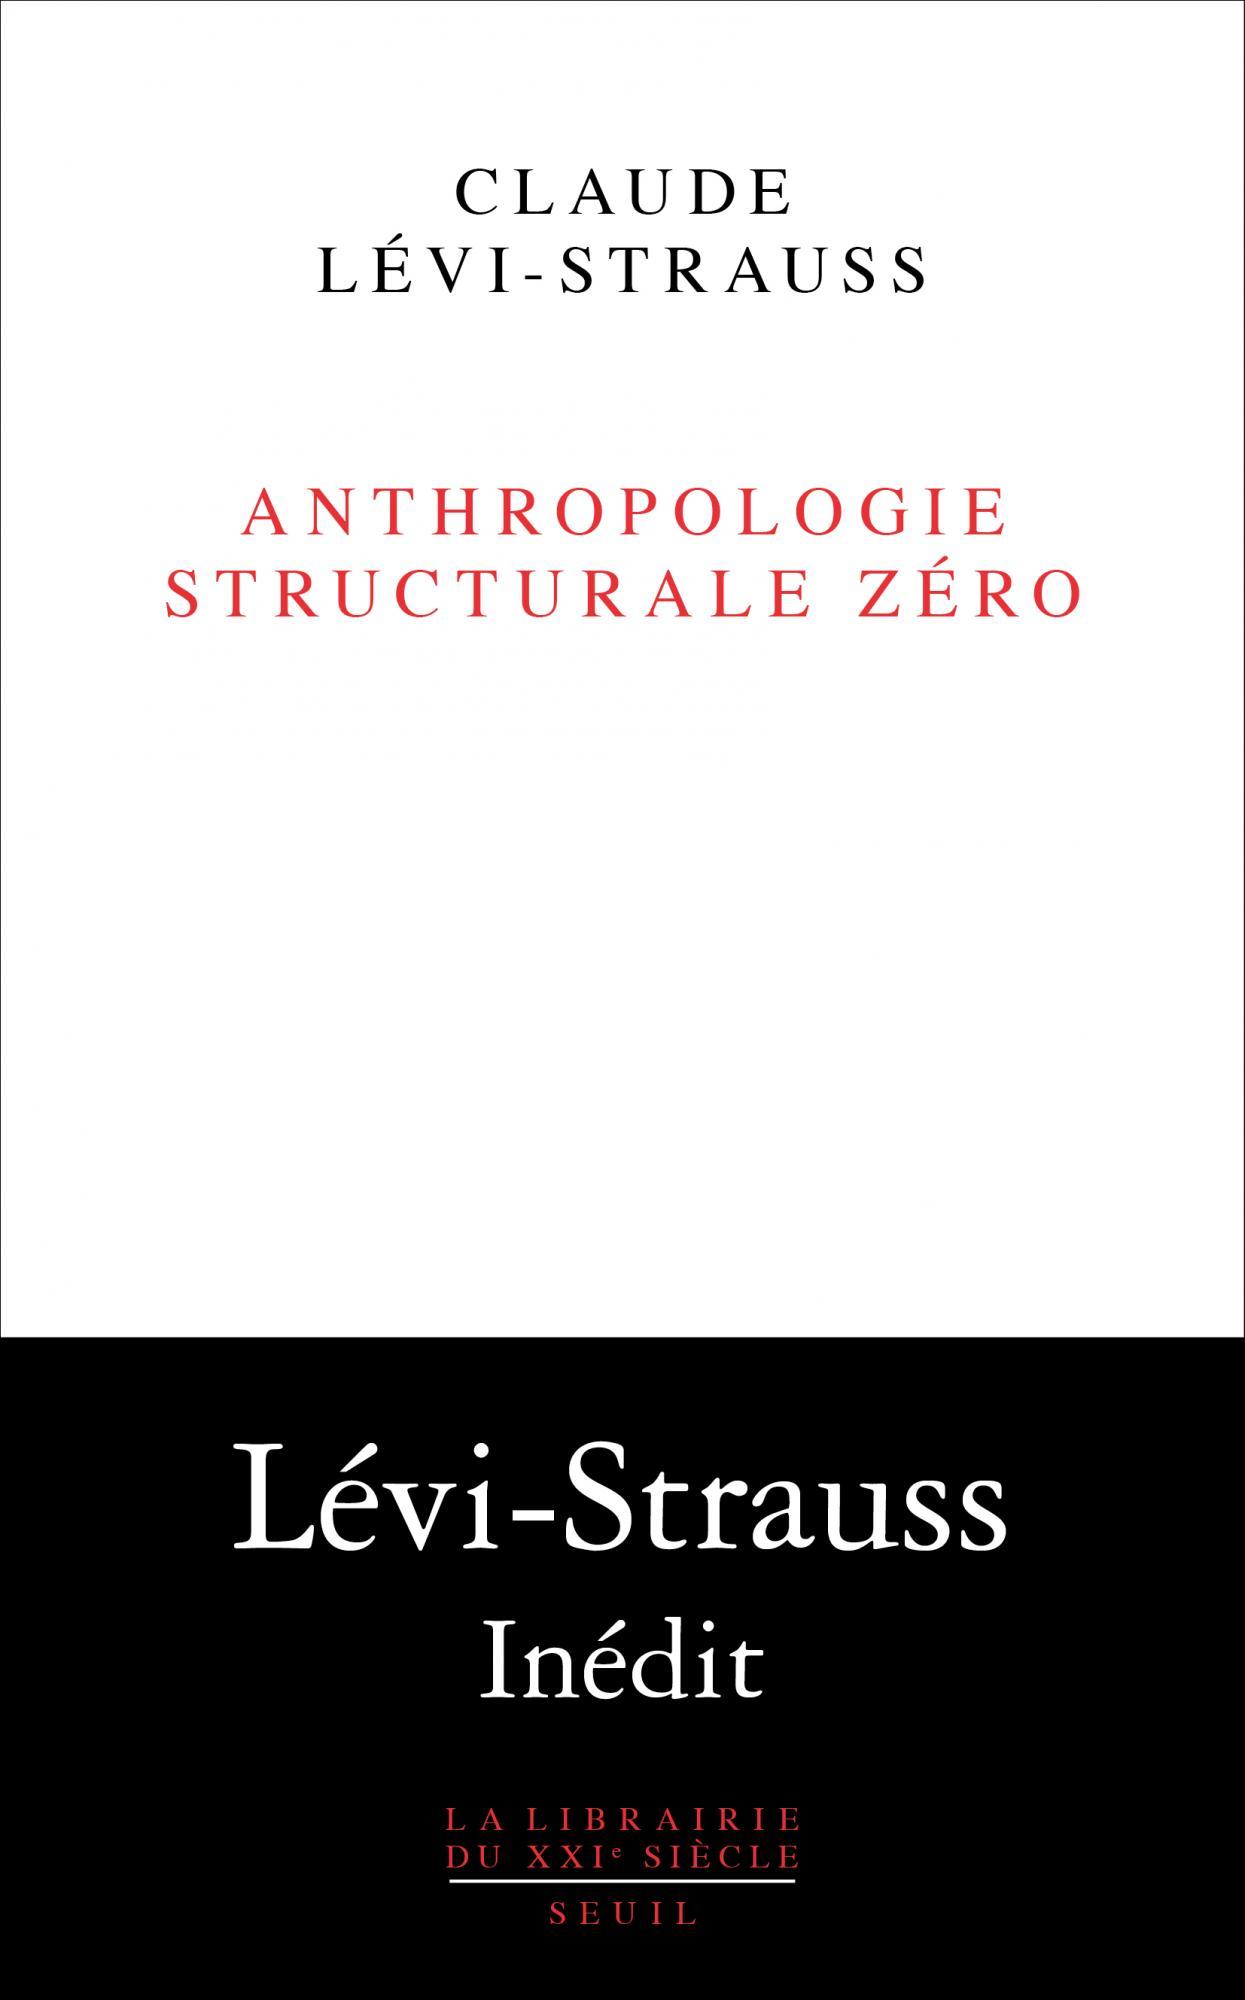 C. Levi-Strauss, Anthropologie structurale zéro (inédit)